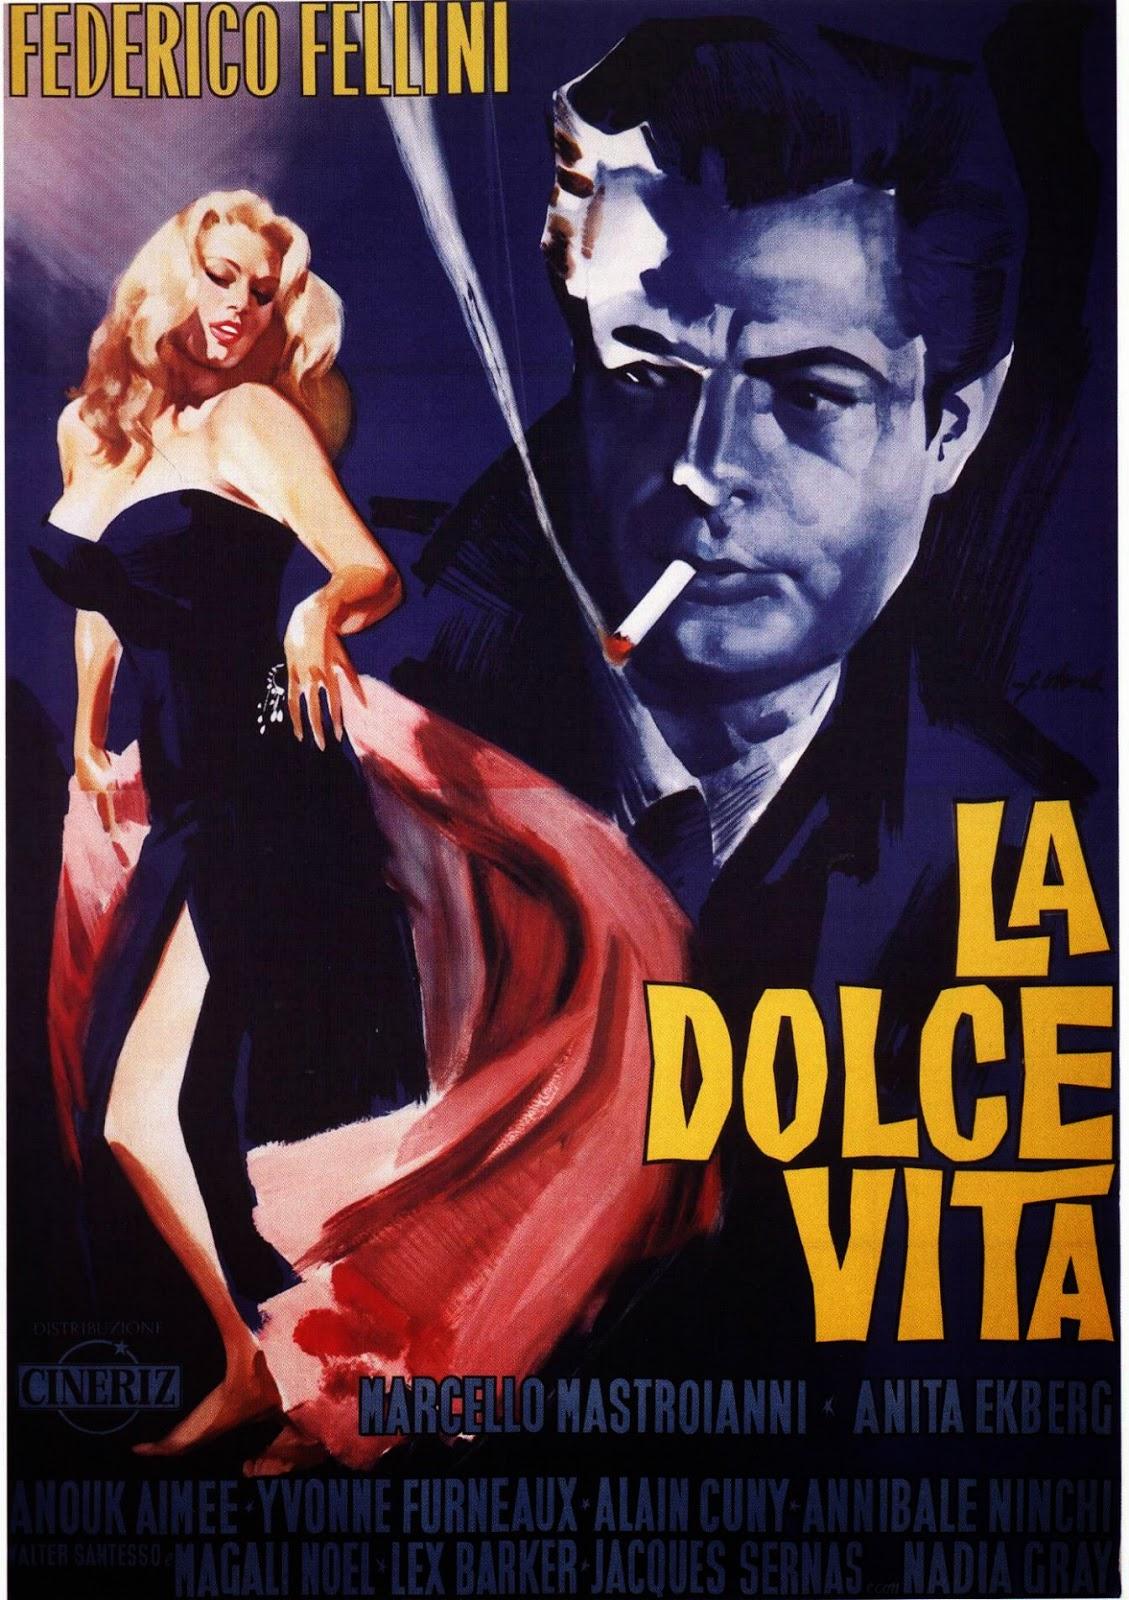 La Dolce Vita - Federico Fellini shot in Capranica different scenes for his famous films Le Luci del Varietà (1950) and La Dolce Vita (1960). The village of Capranica in fact embodies, for a few eternal moments, in the director's films, the quintessence of the Italian landscape.